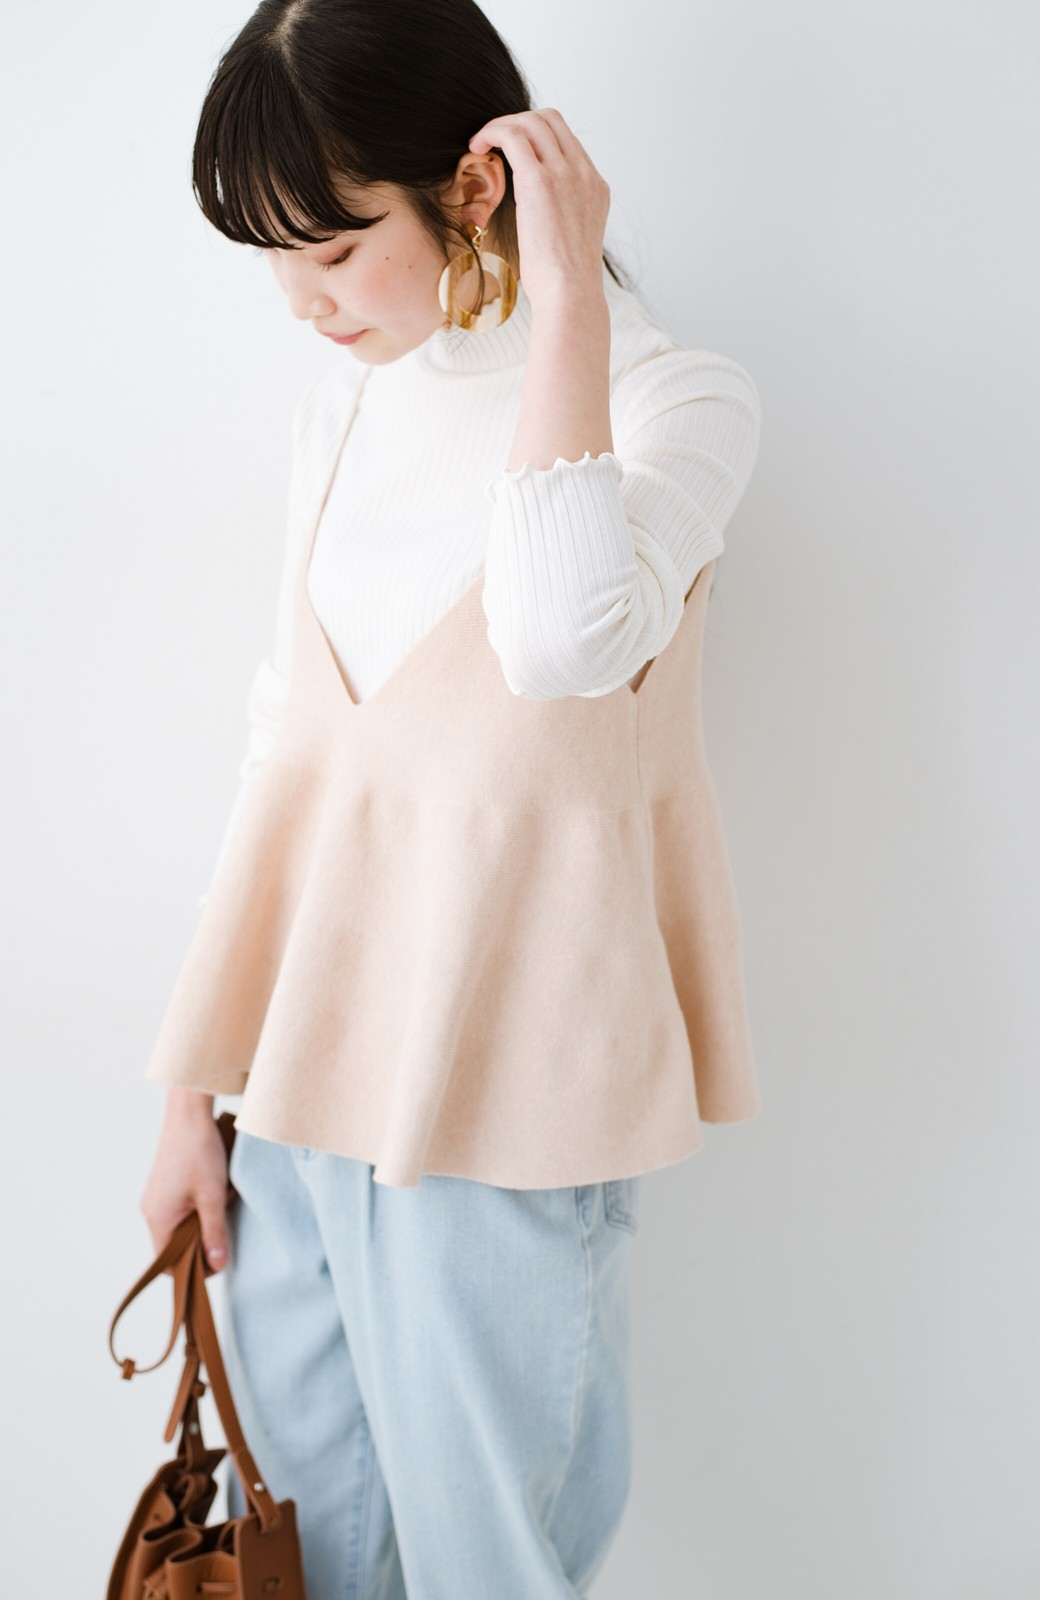 haco! ニットワンピースとキャミソールを重ねて着るだけでパッとオシャレに見えるうれしいセット by style zampa <ライトベージュ>の商品写真15